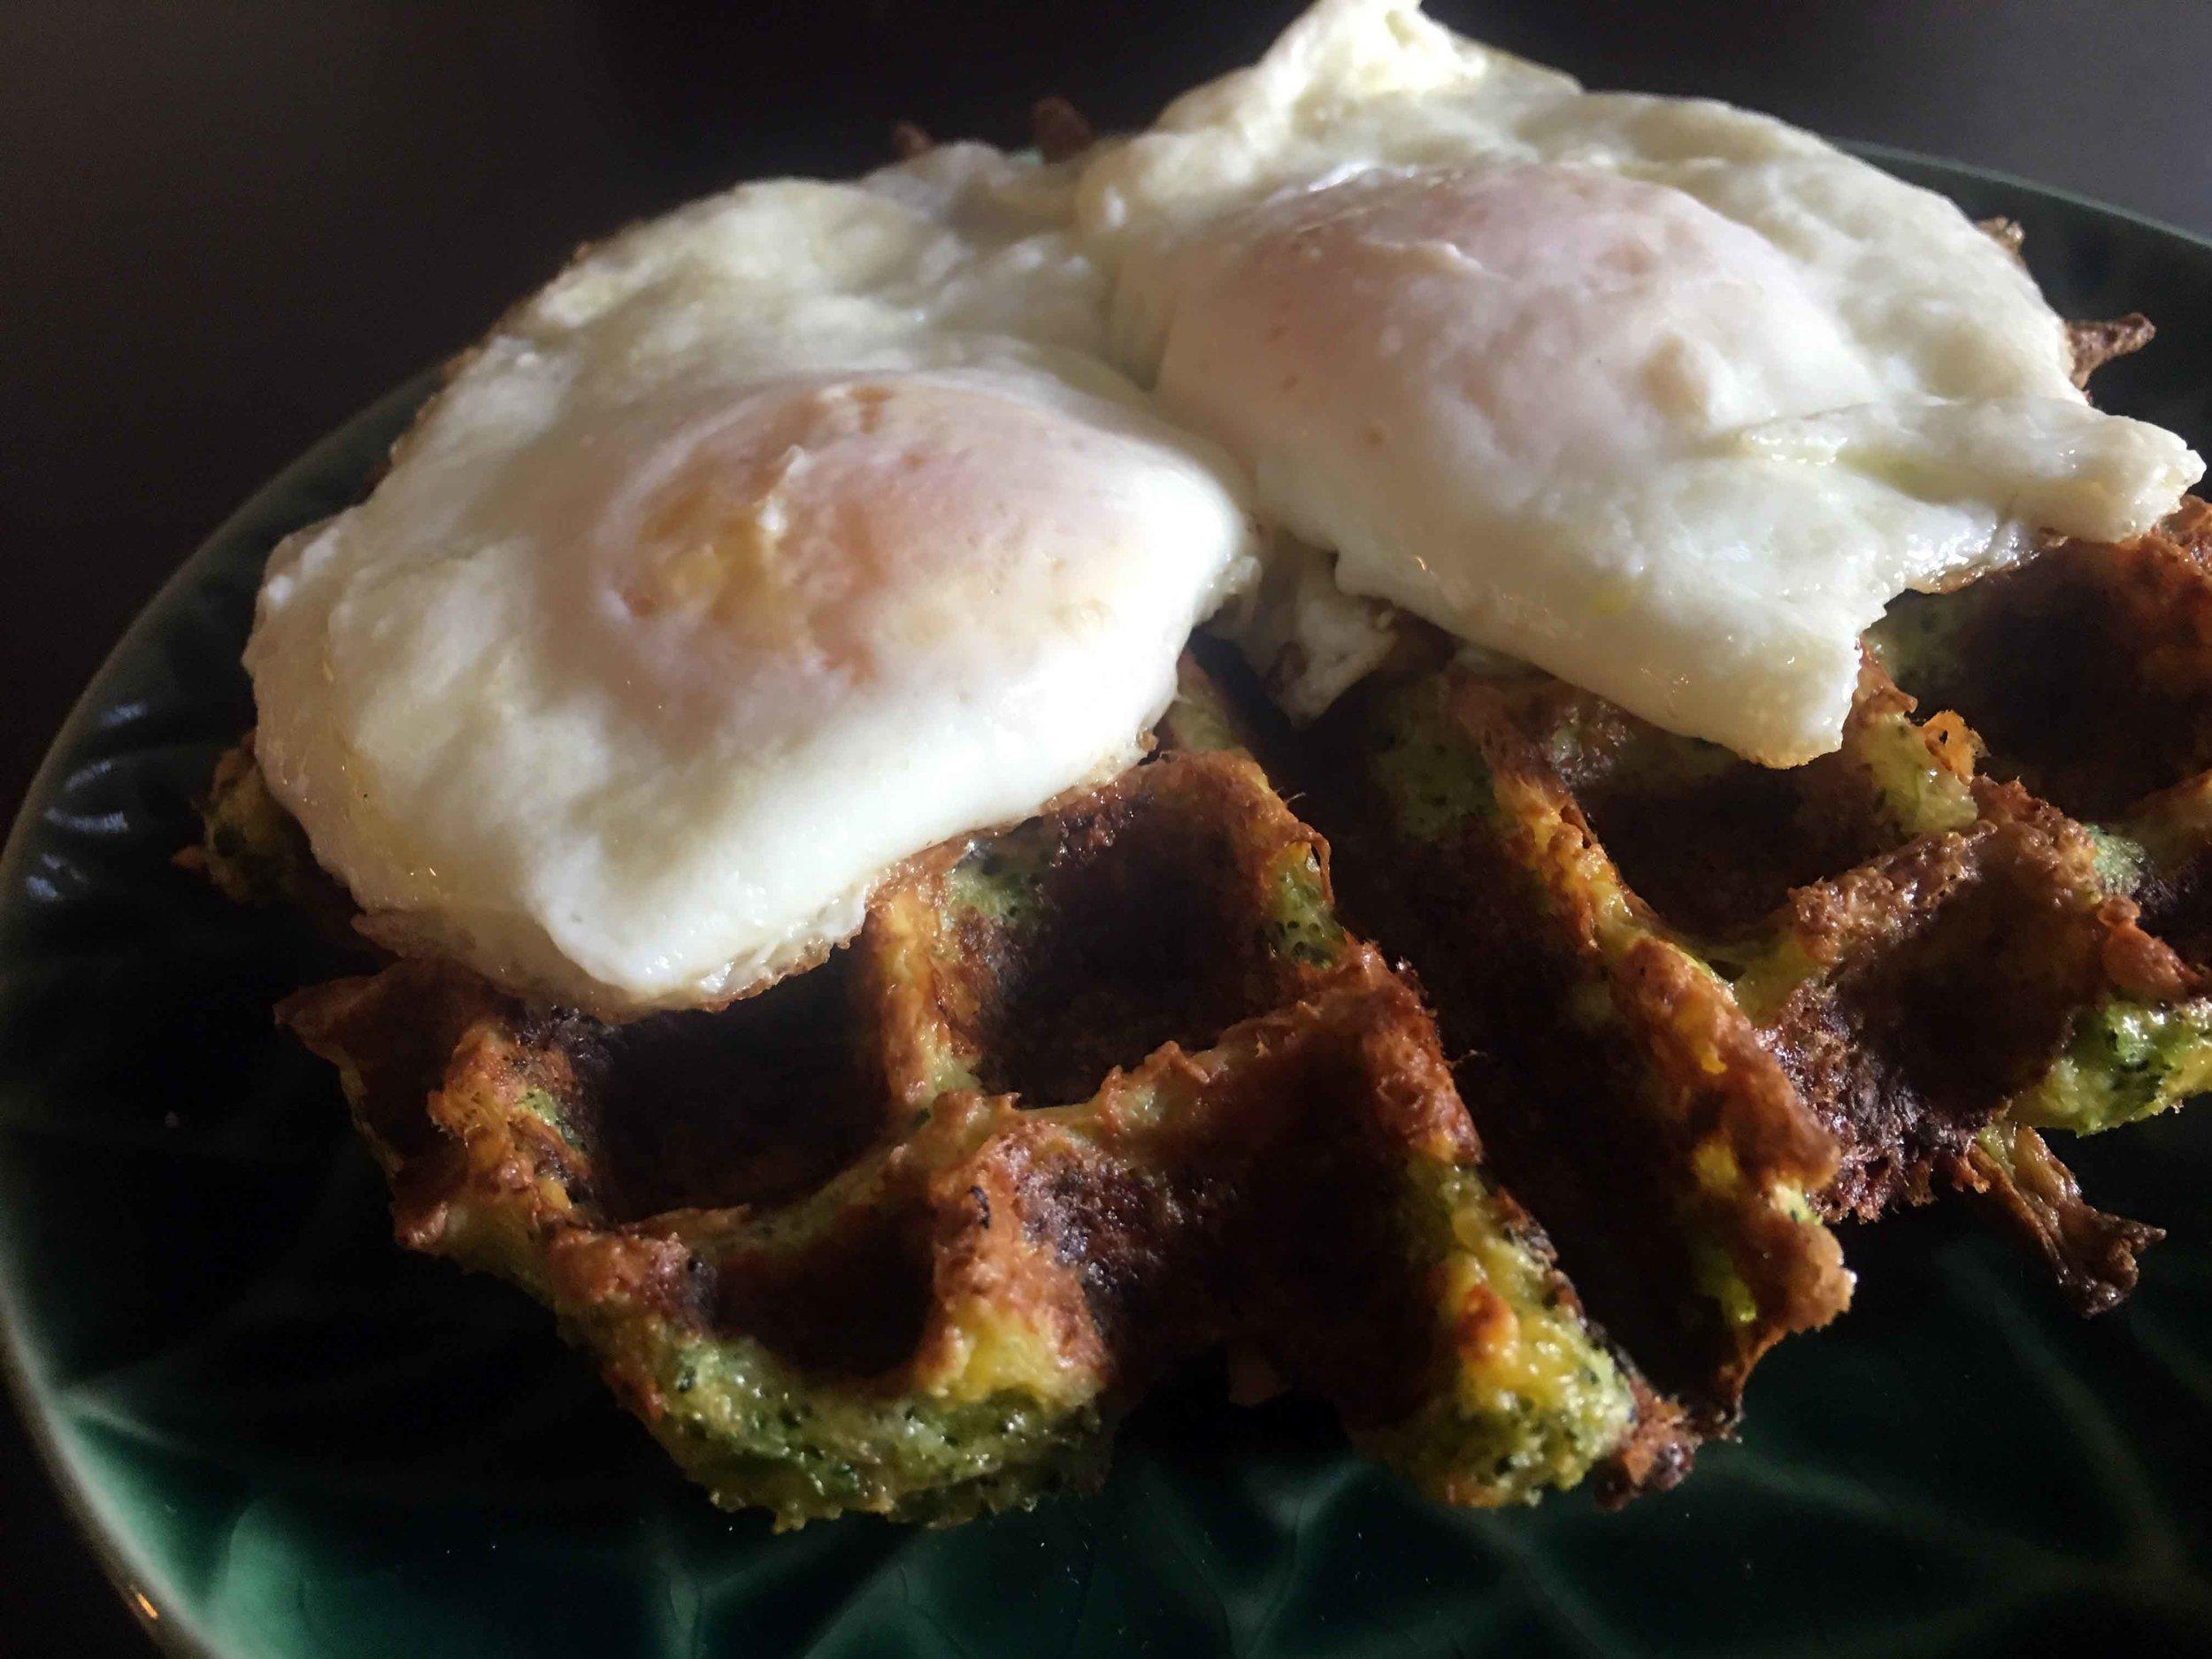 Low Carb Keto Broccoli Cheese Waffle Recipe